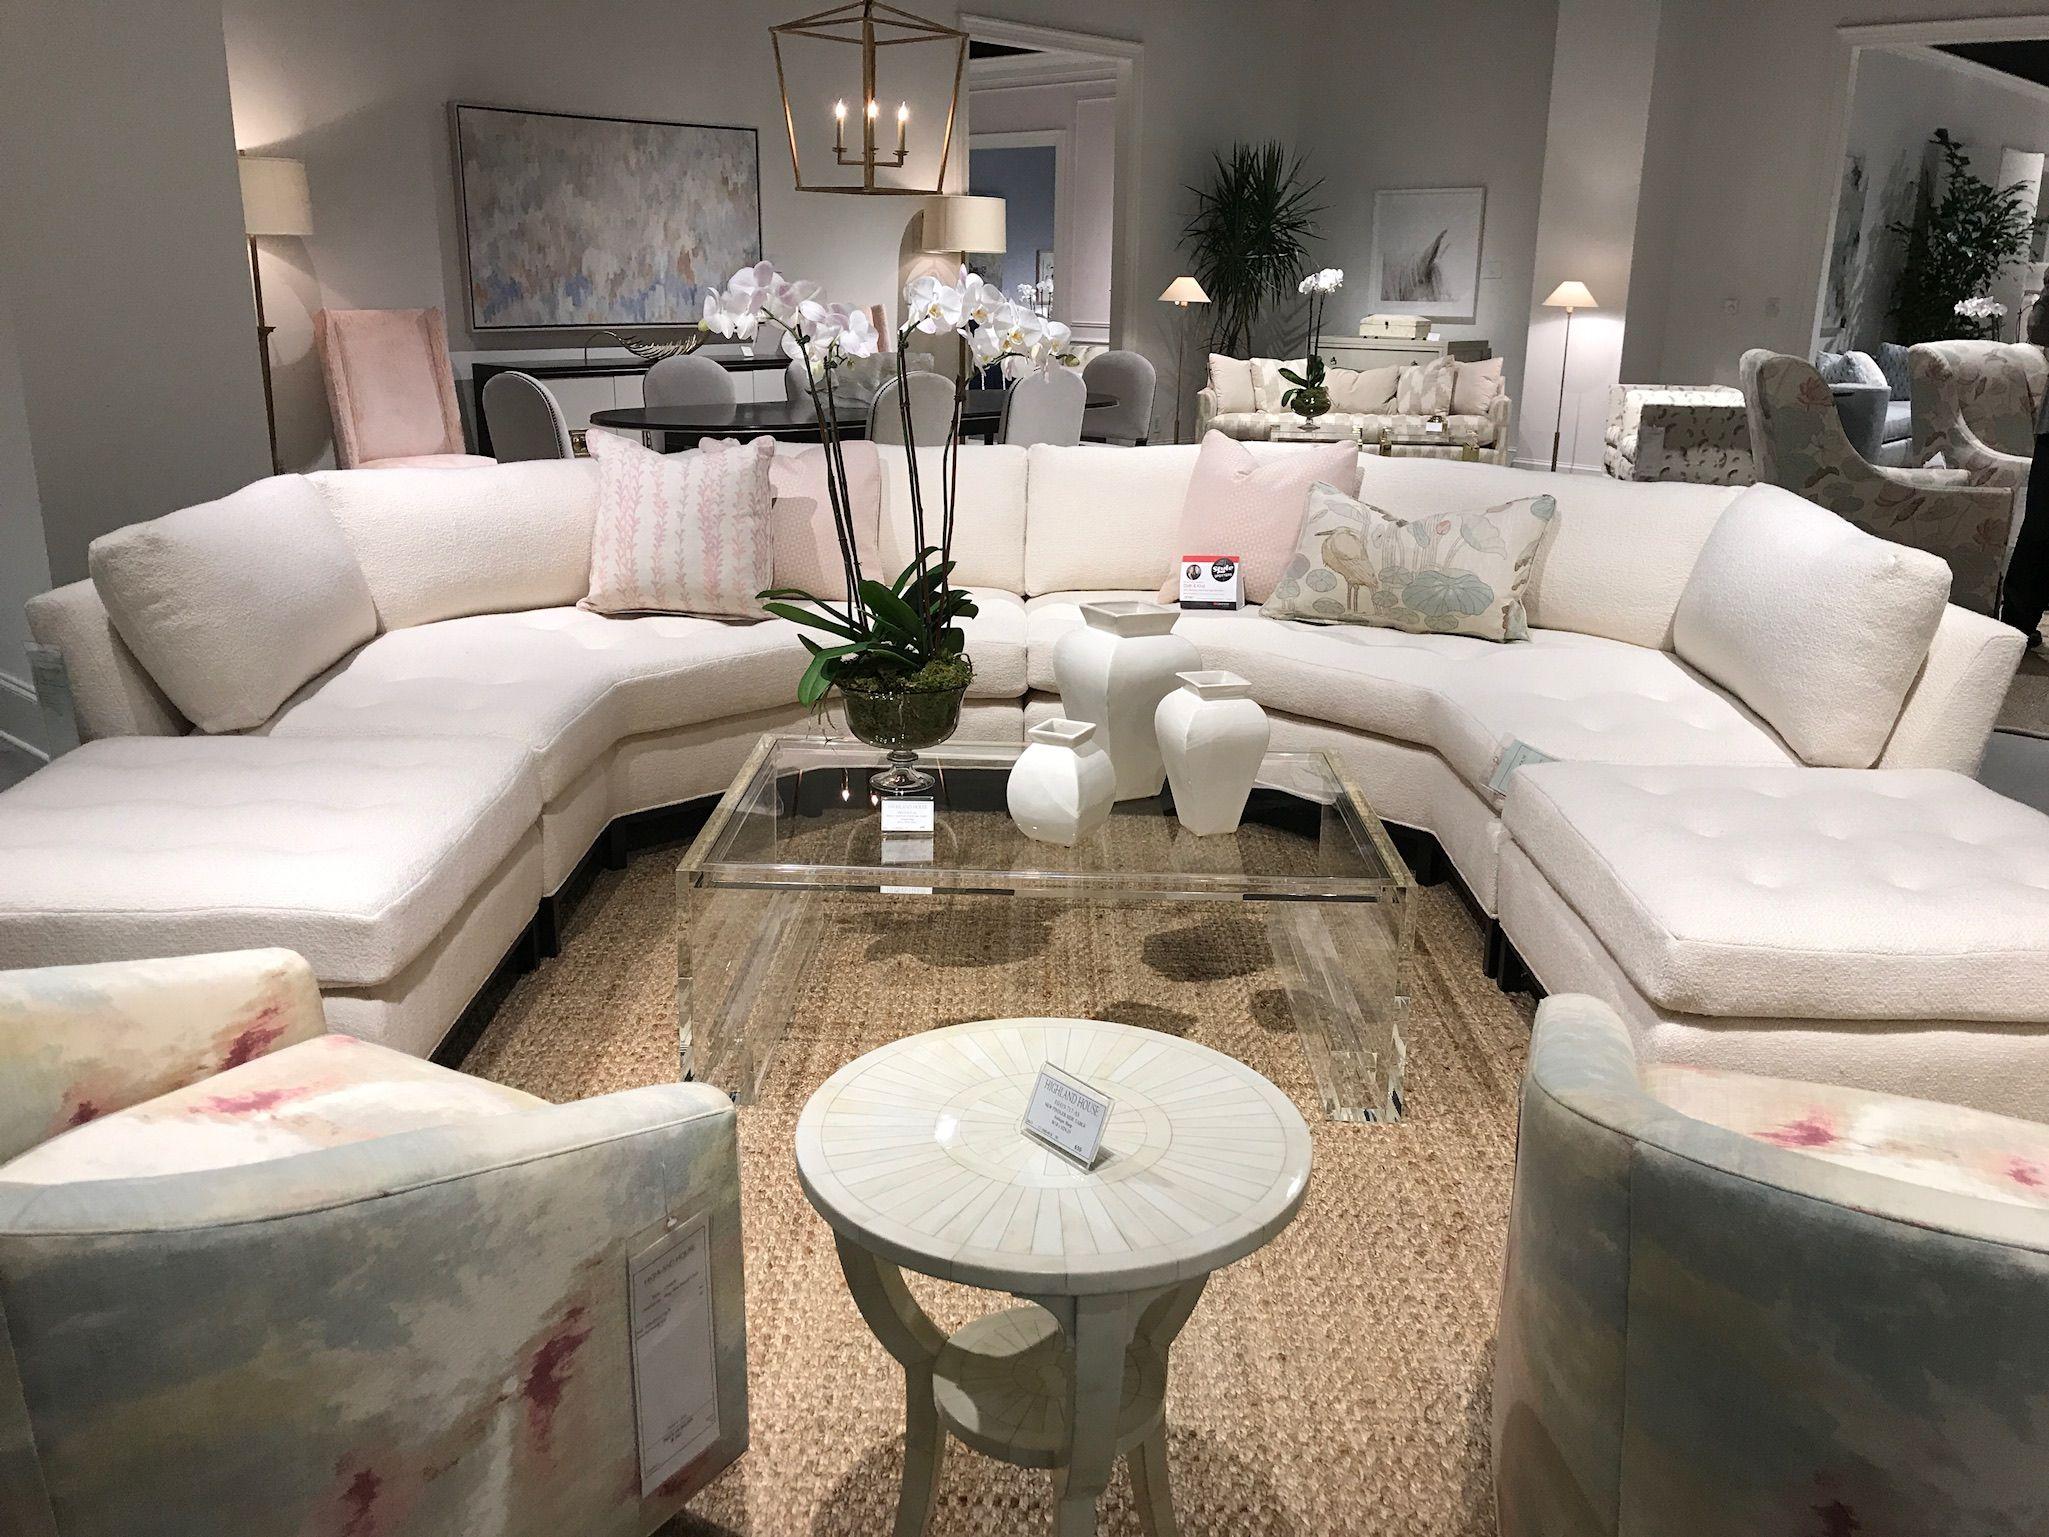 Sebastian Angled Sectional From Highland House Furniture Showroom